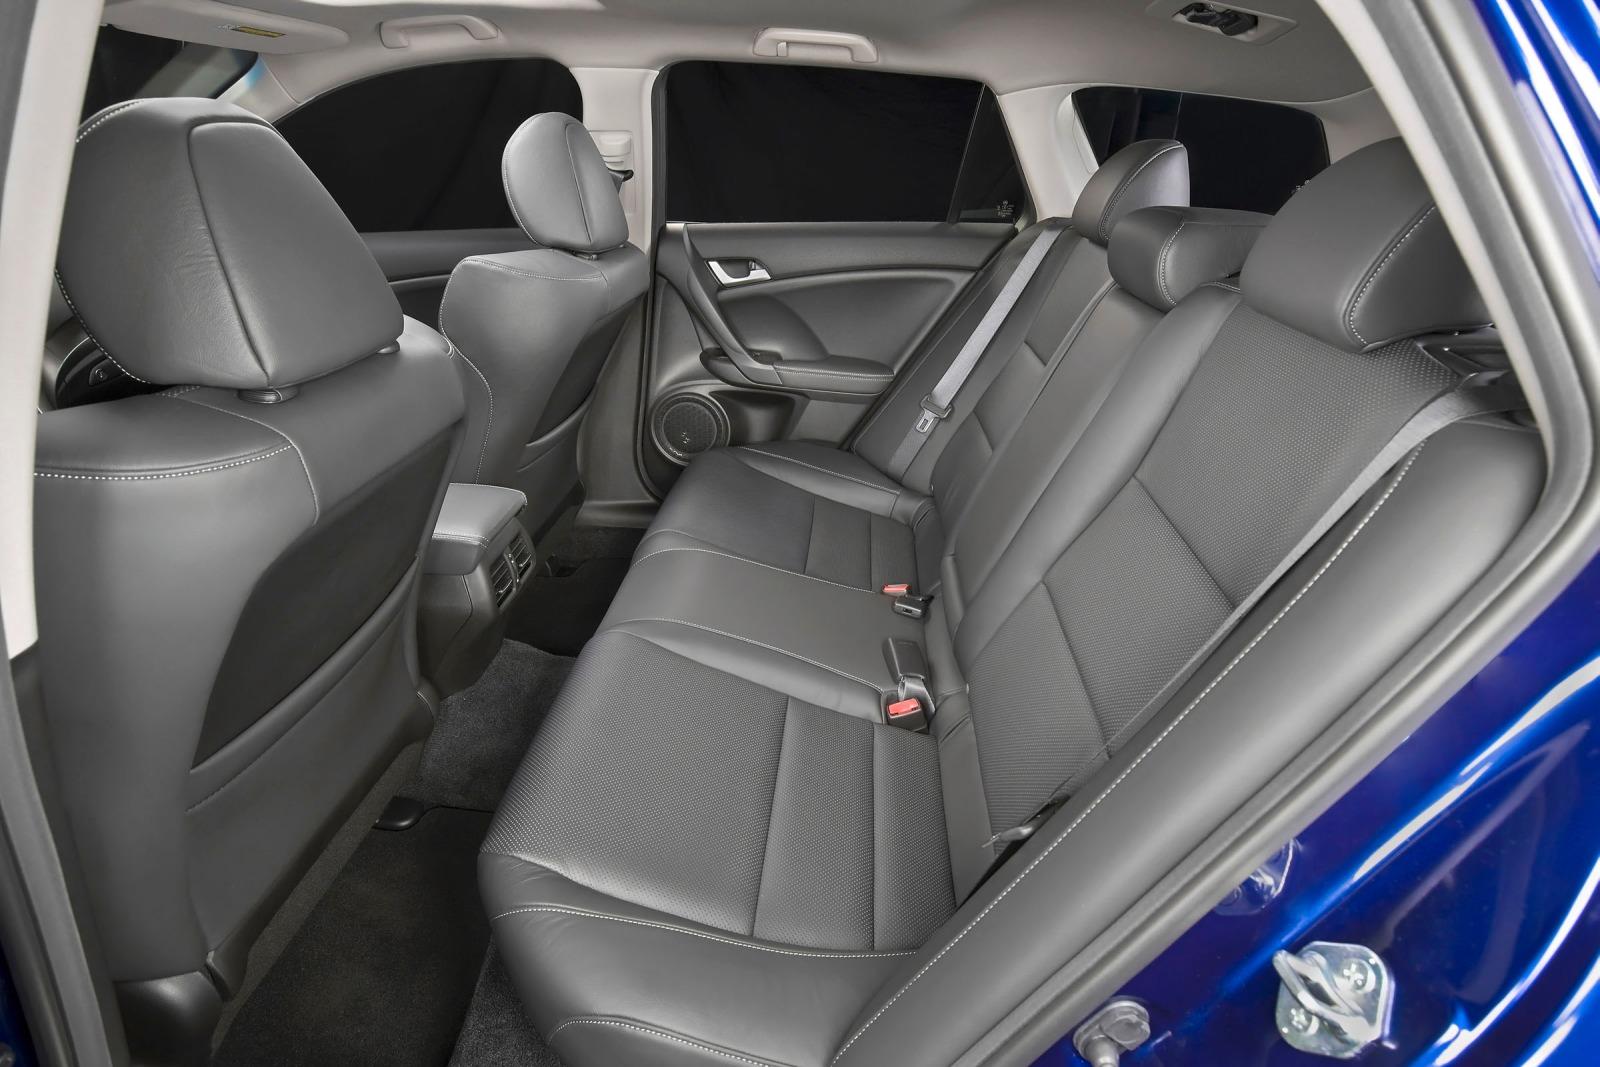 2013 acura tsx sport wagon 6 2012 acura tsx sport wago interior 6